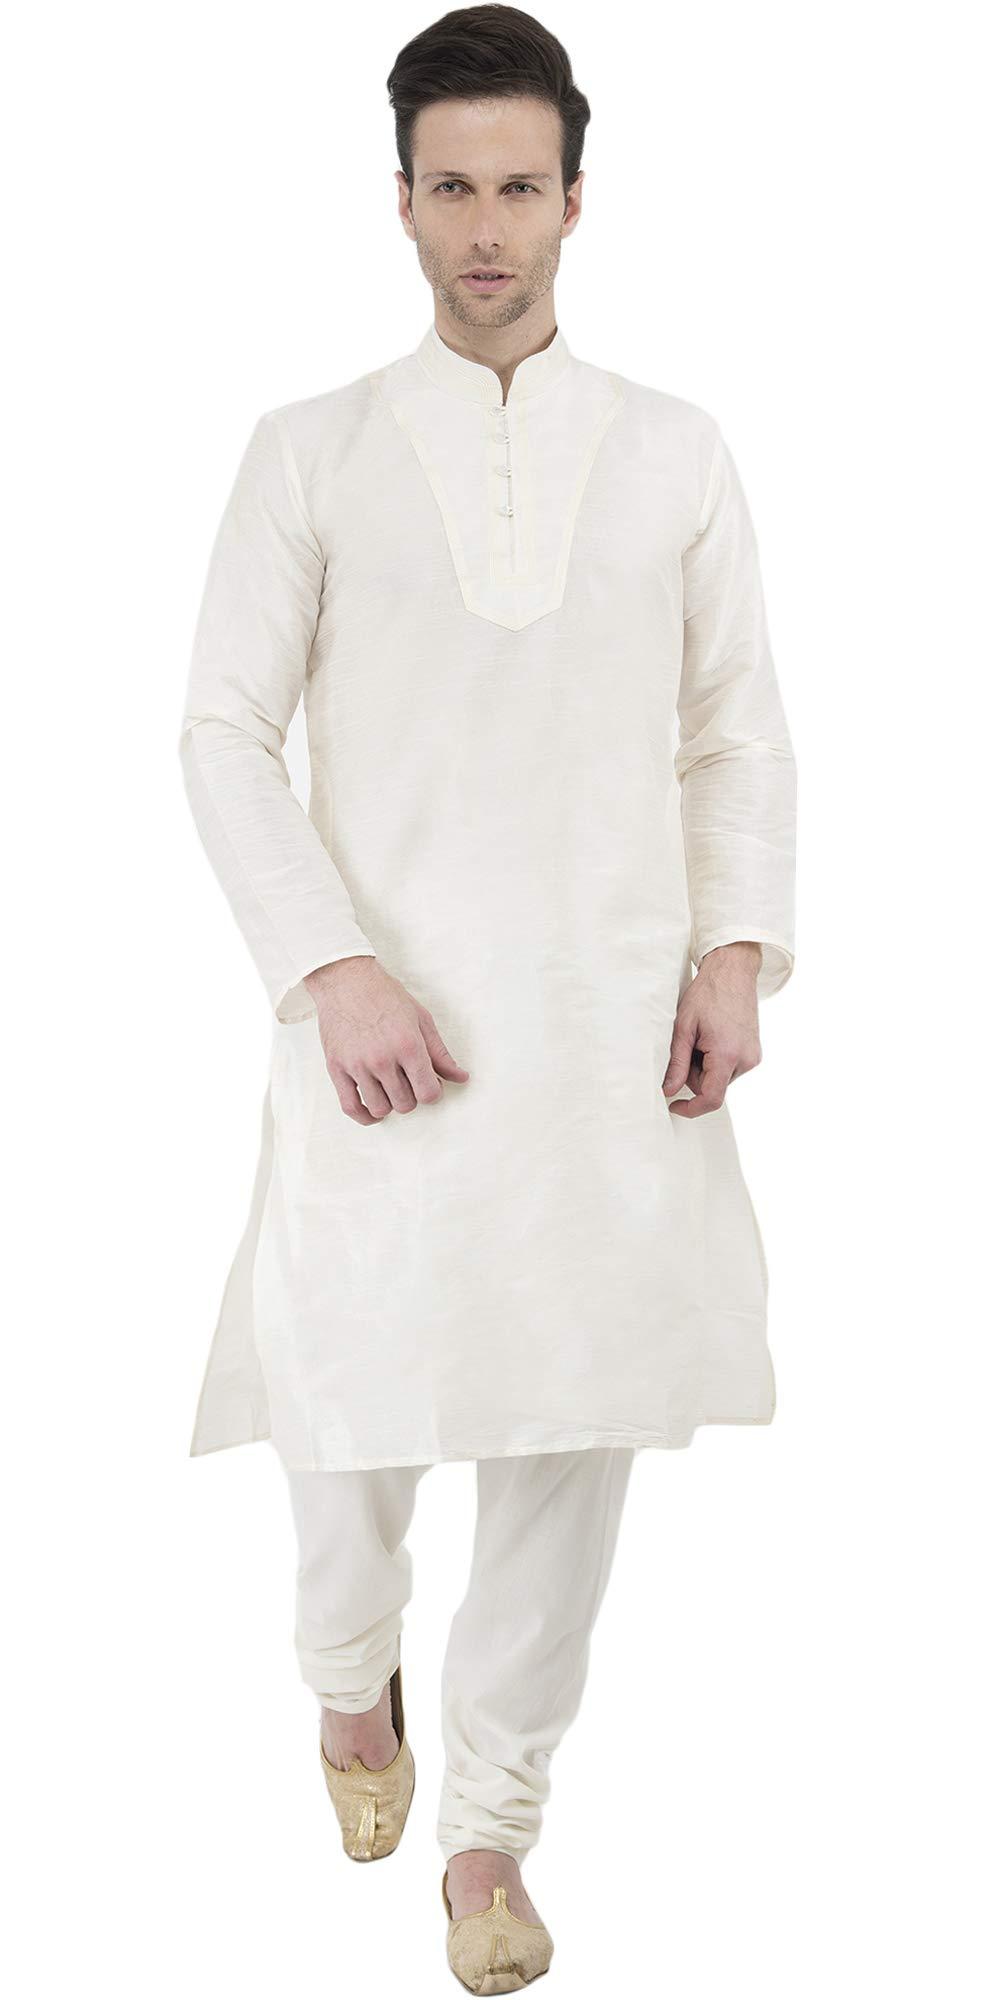 Kurta Pyjama Indian Designer Wedding Mens Long Sleeve Button Down Shirt Kurta Pyjama -L